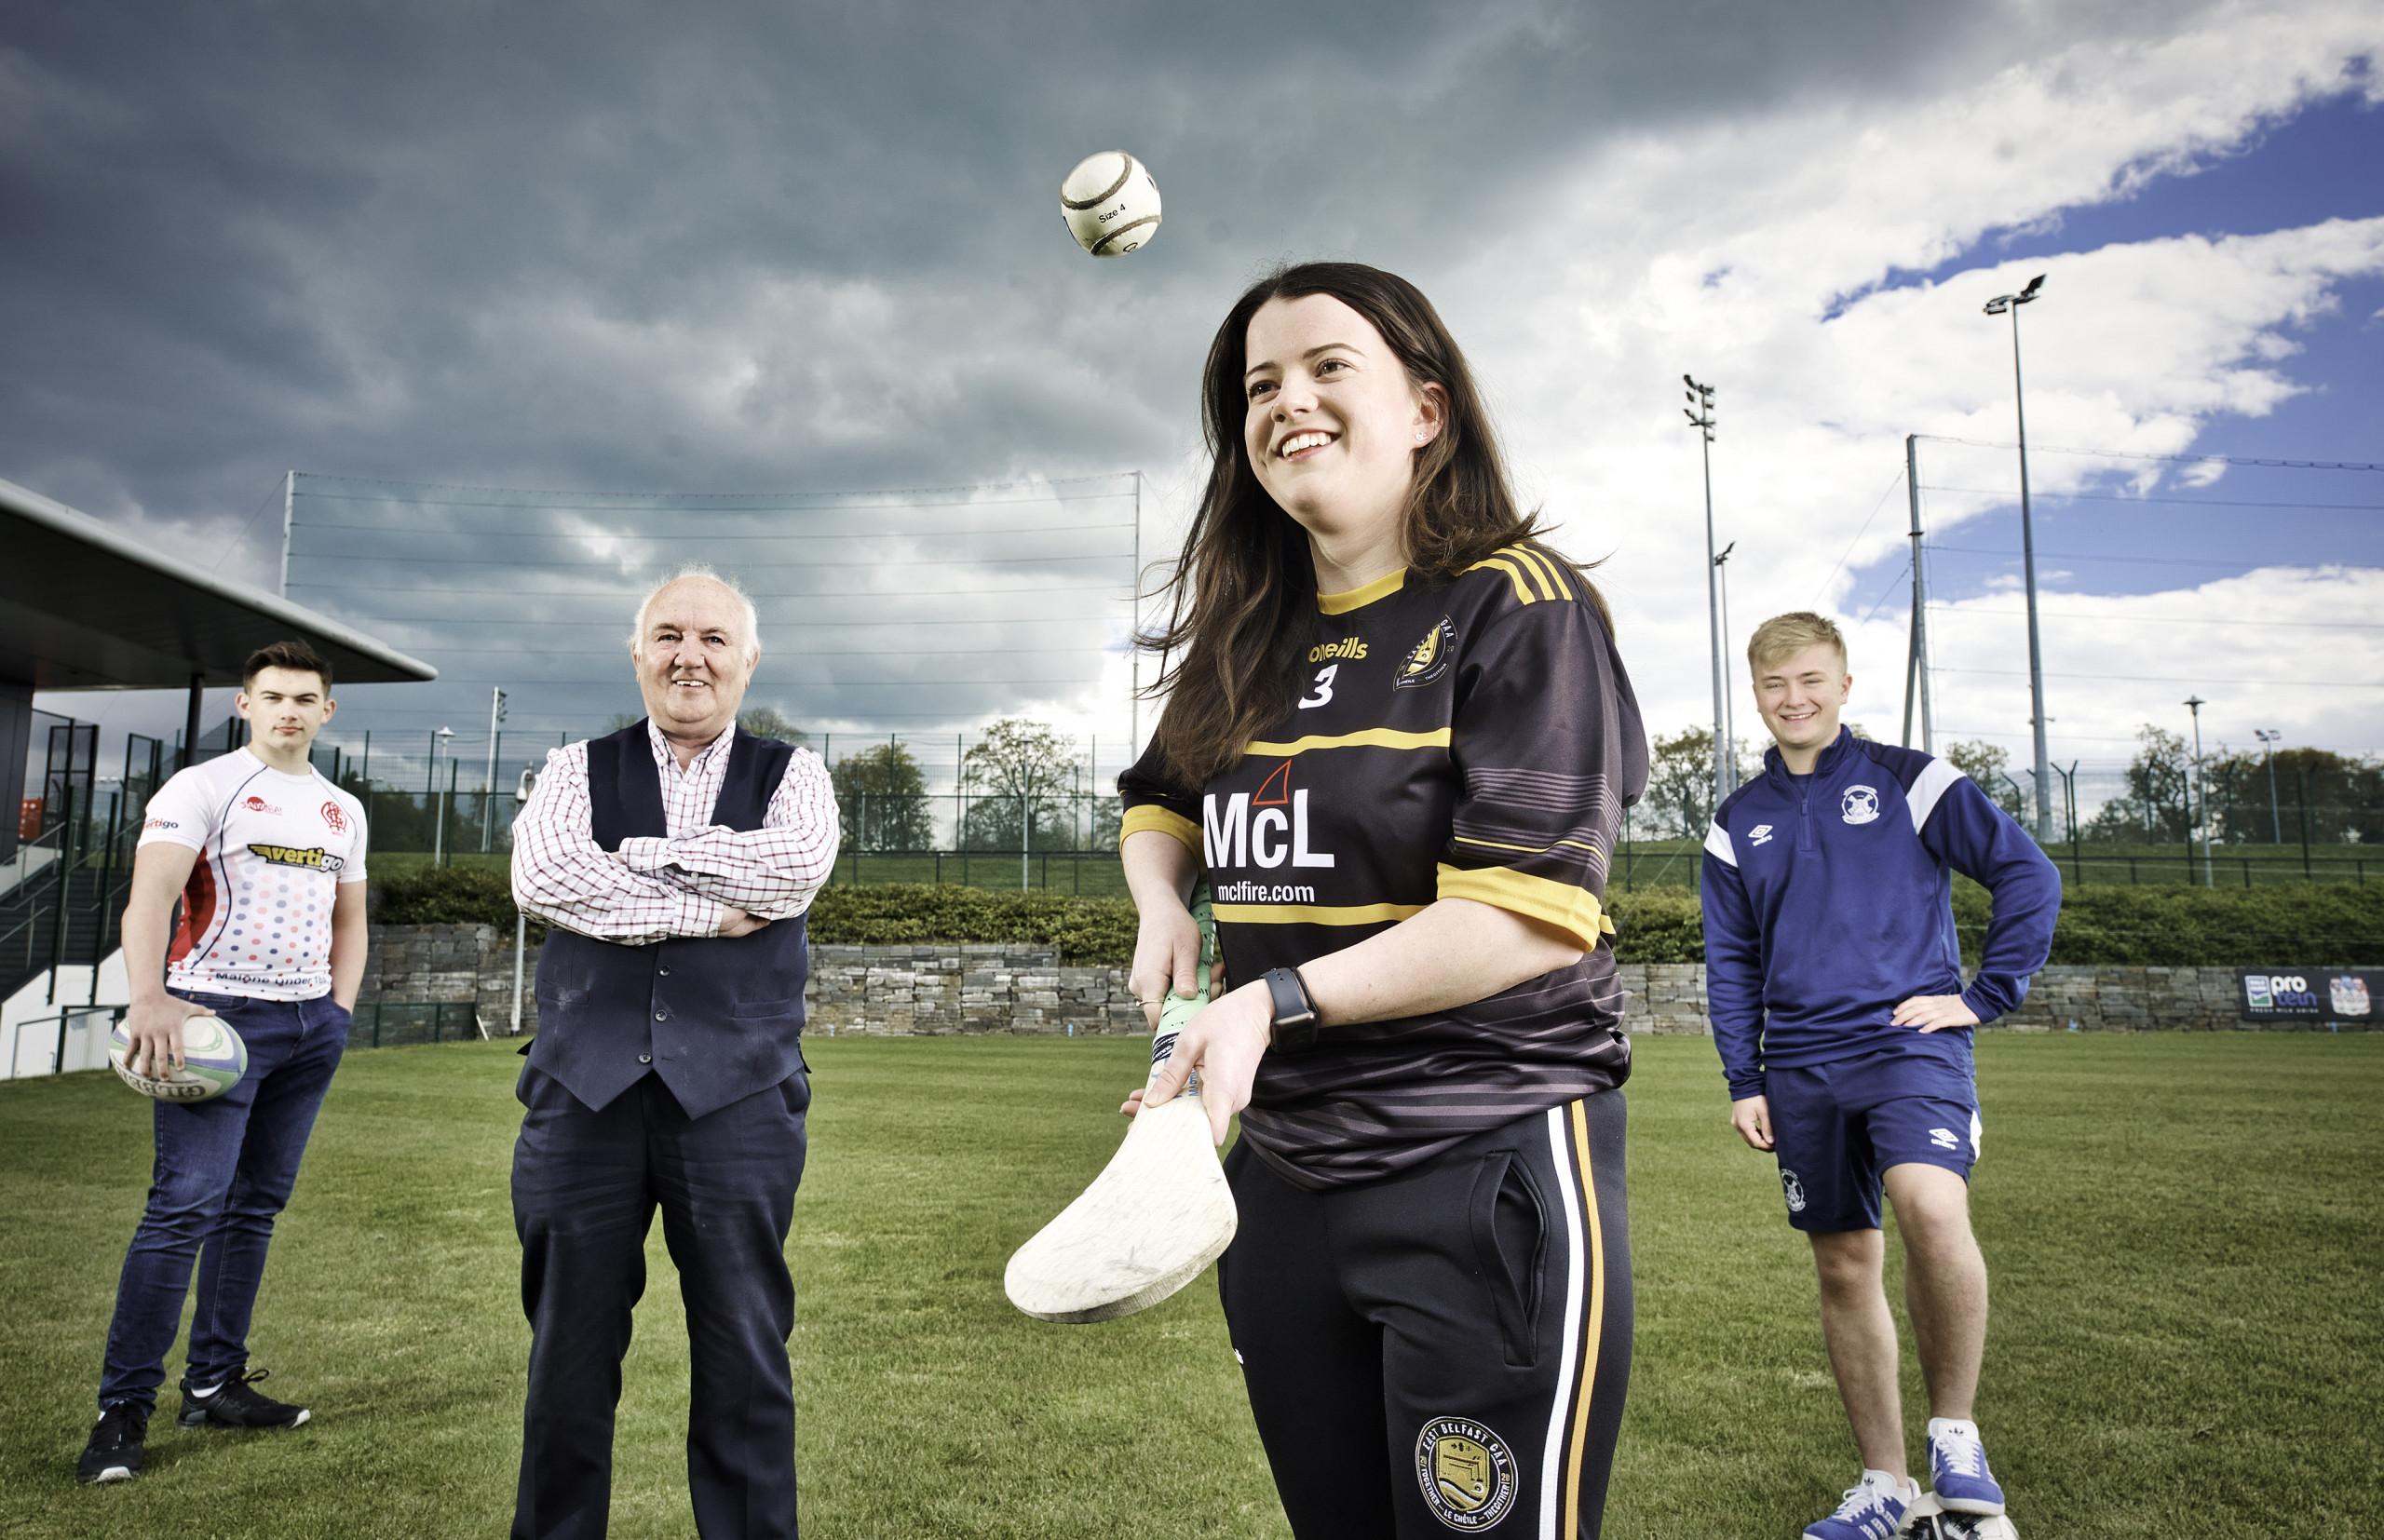 Young GAA Volunteers among those to gain major skills boost through leadership programme.